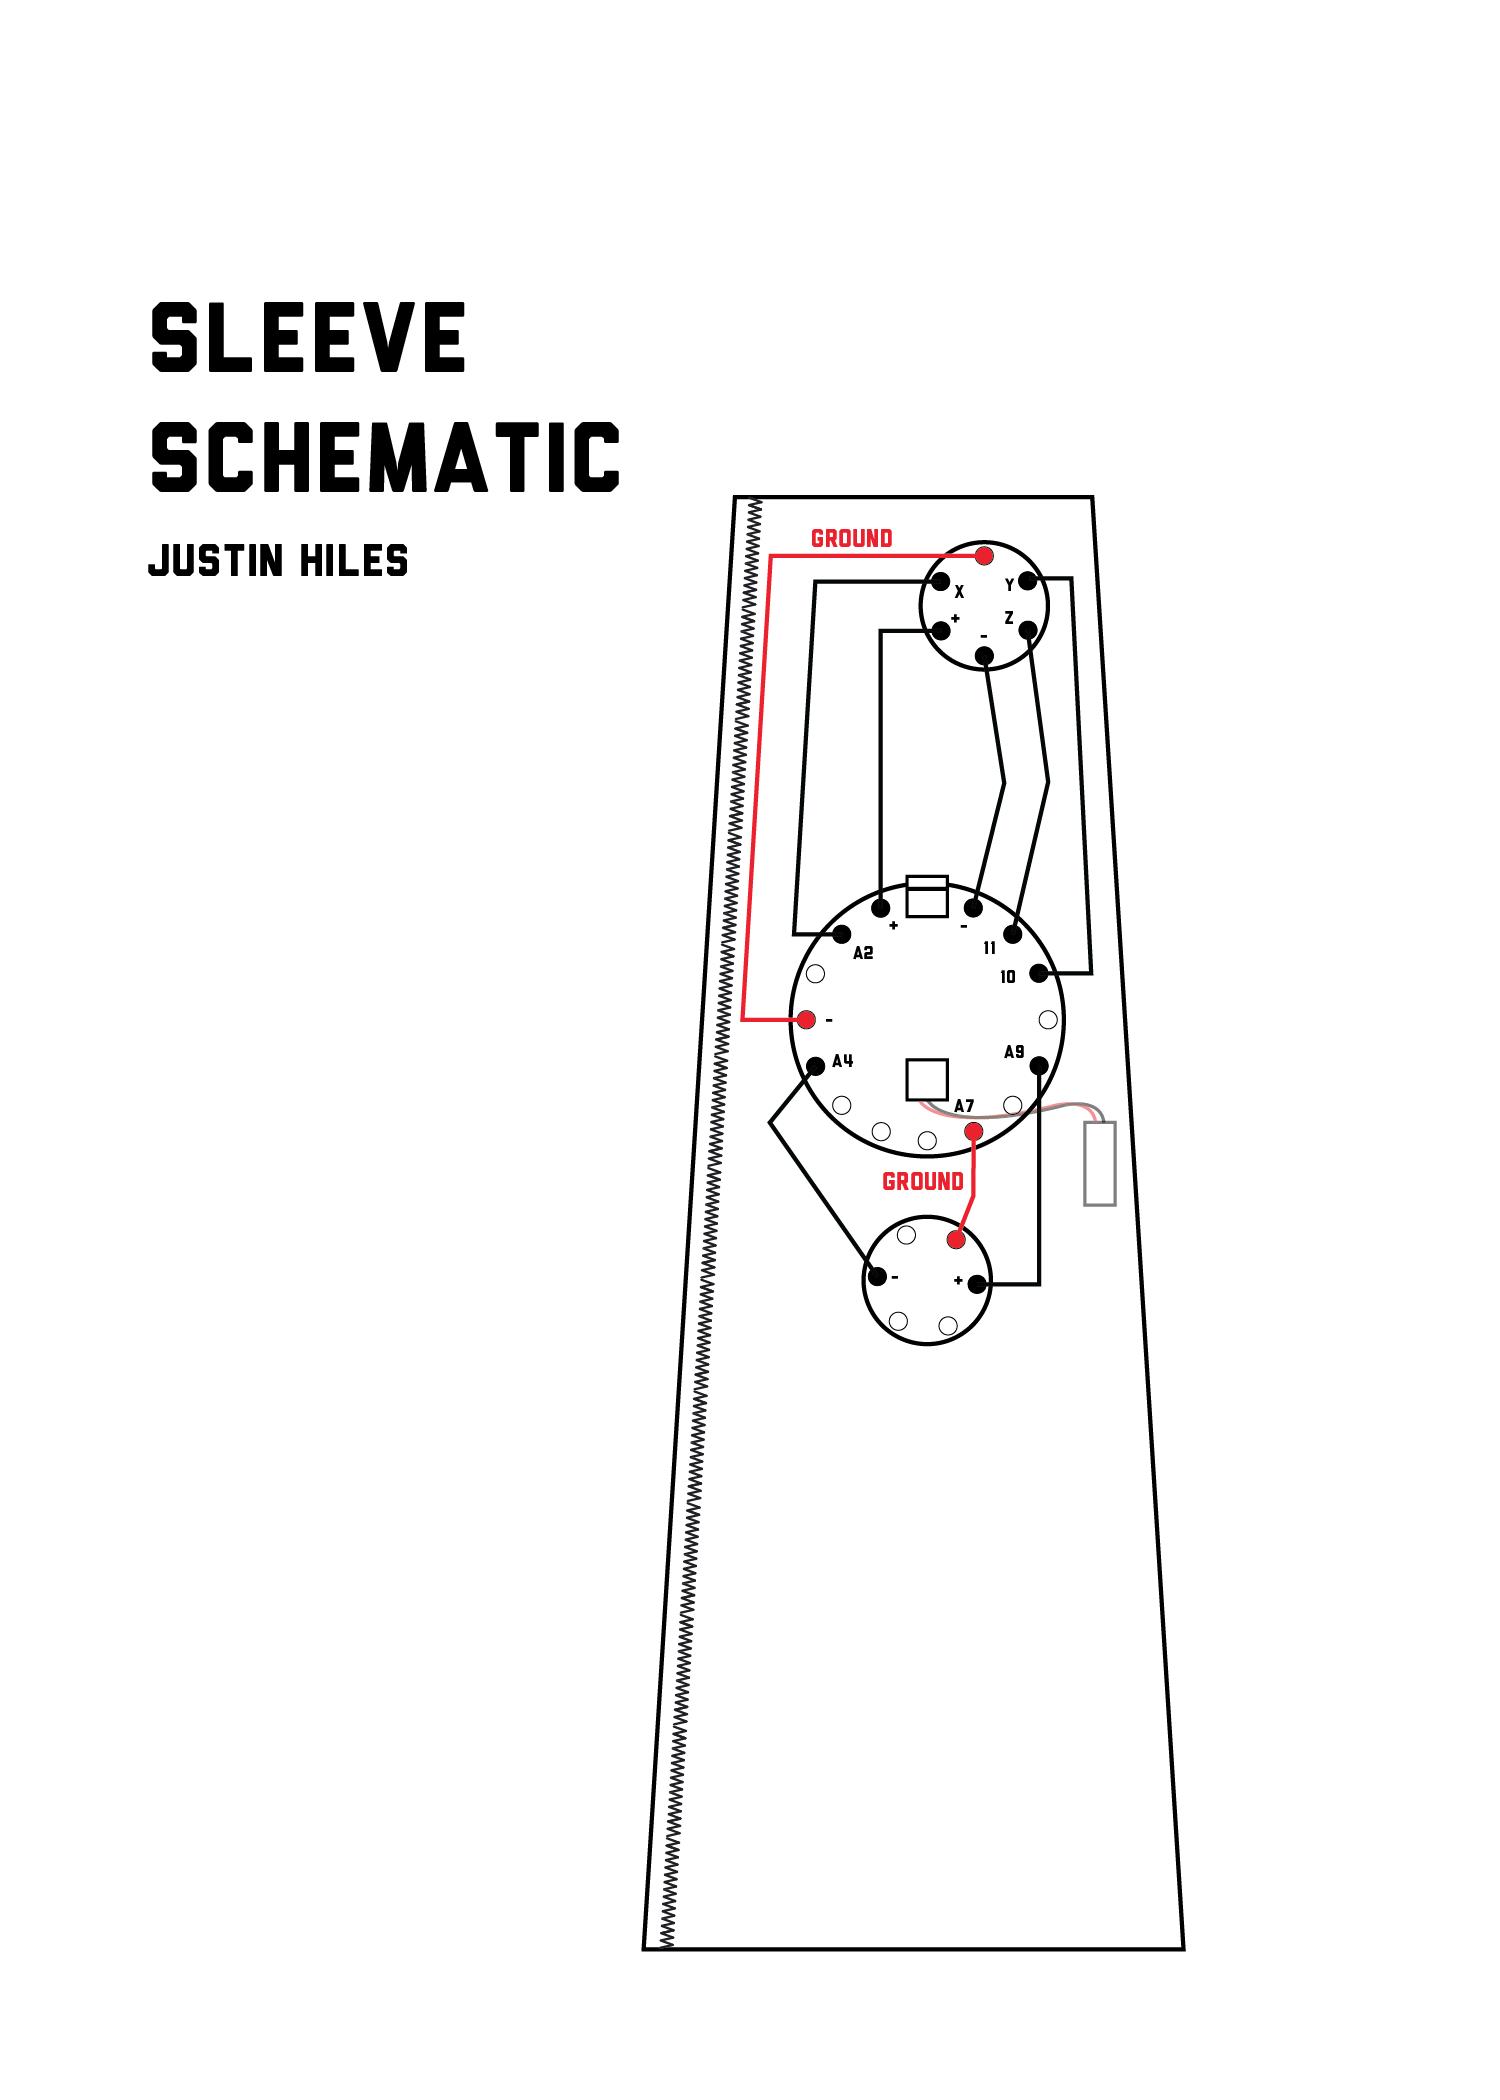 Sleeve schematic 01 mxil73lxix